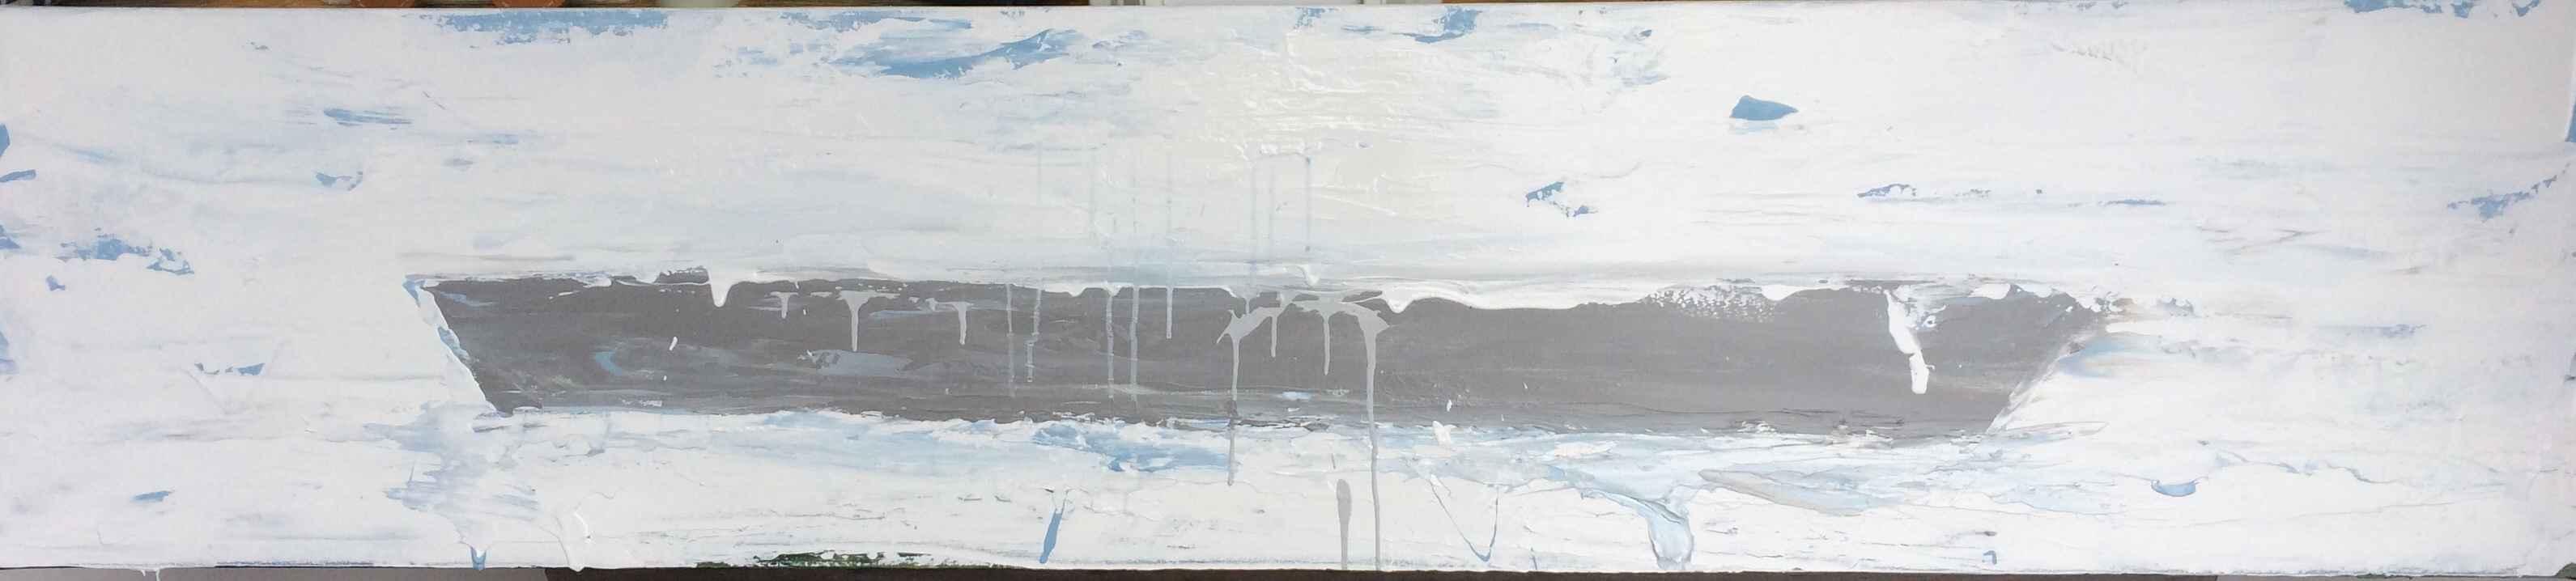 Qayaq At Lands End by  Steve Lyons - Masterpiece Online